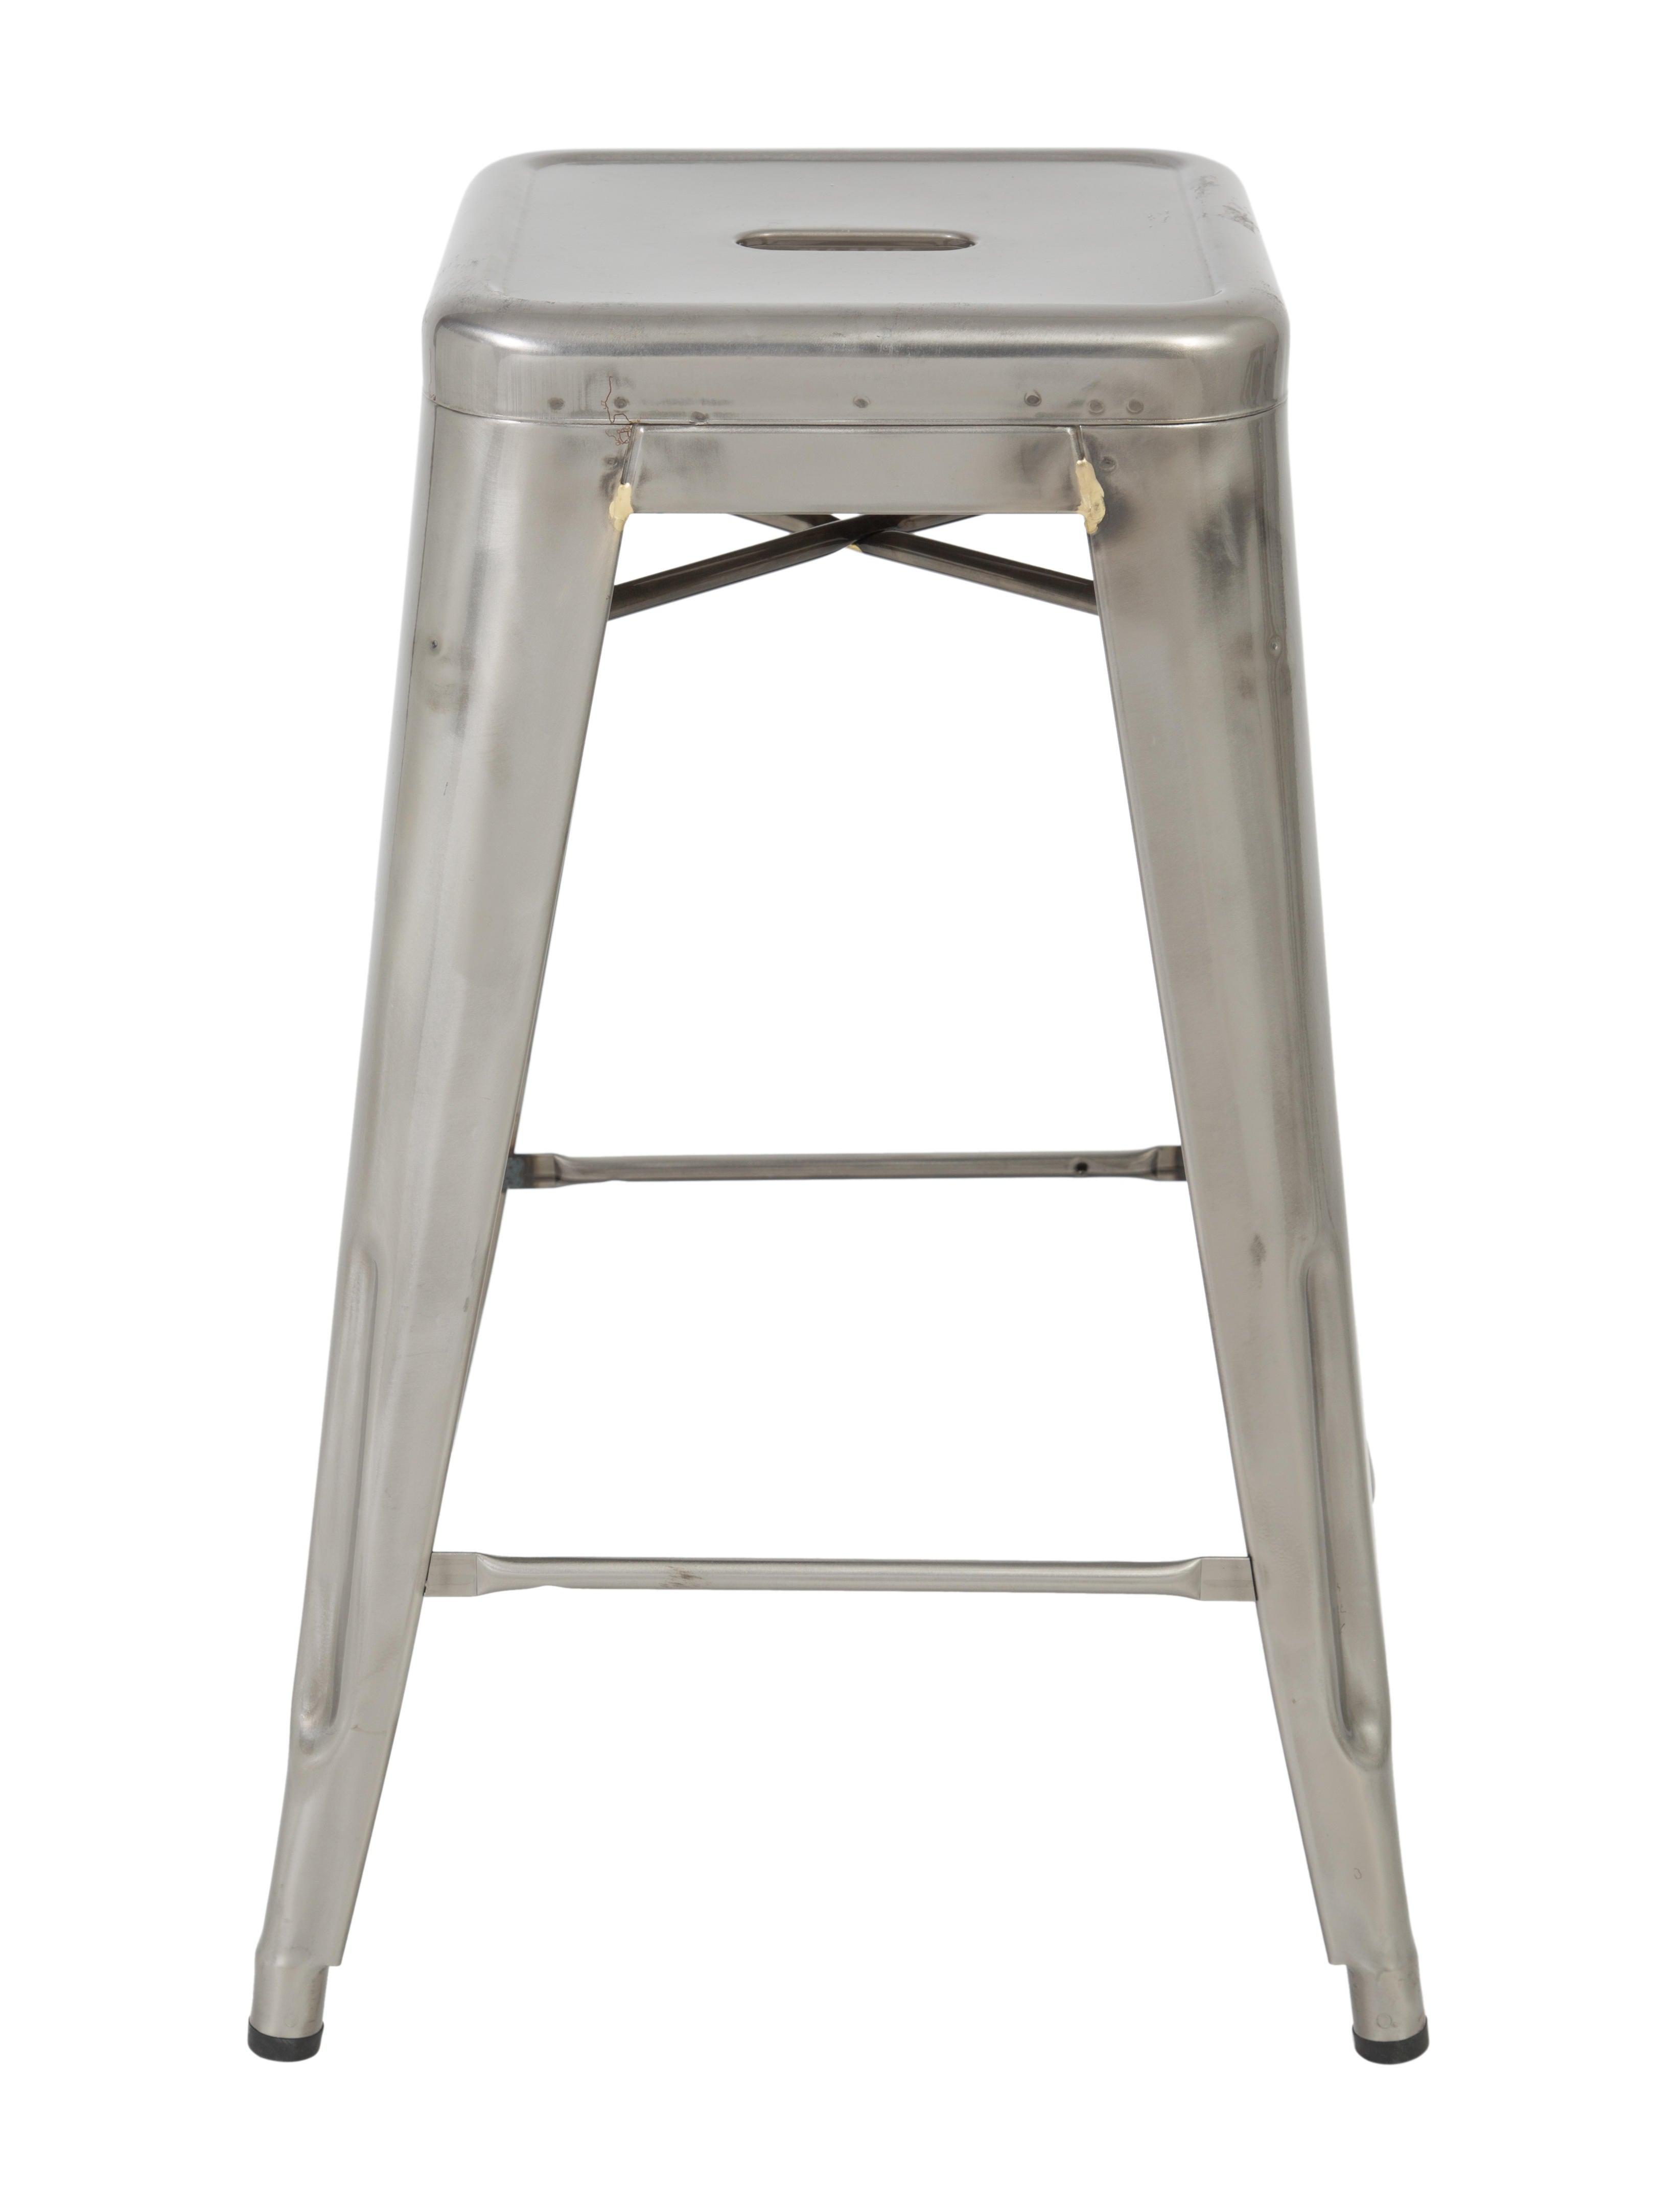 Tolix marais counter stools furniture furni20414 the realreal - Tolix counter stools ...